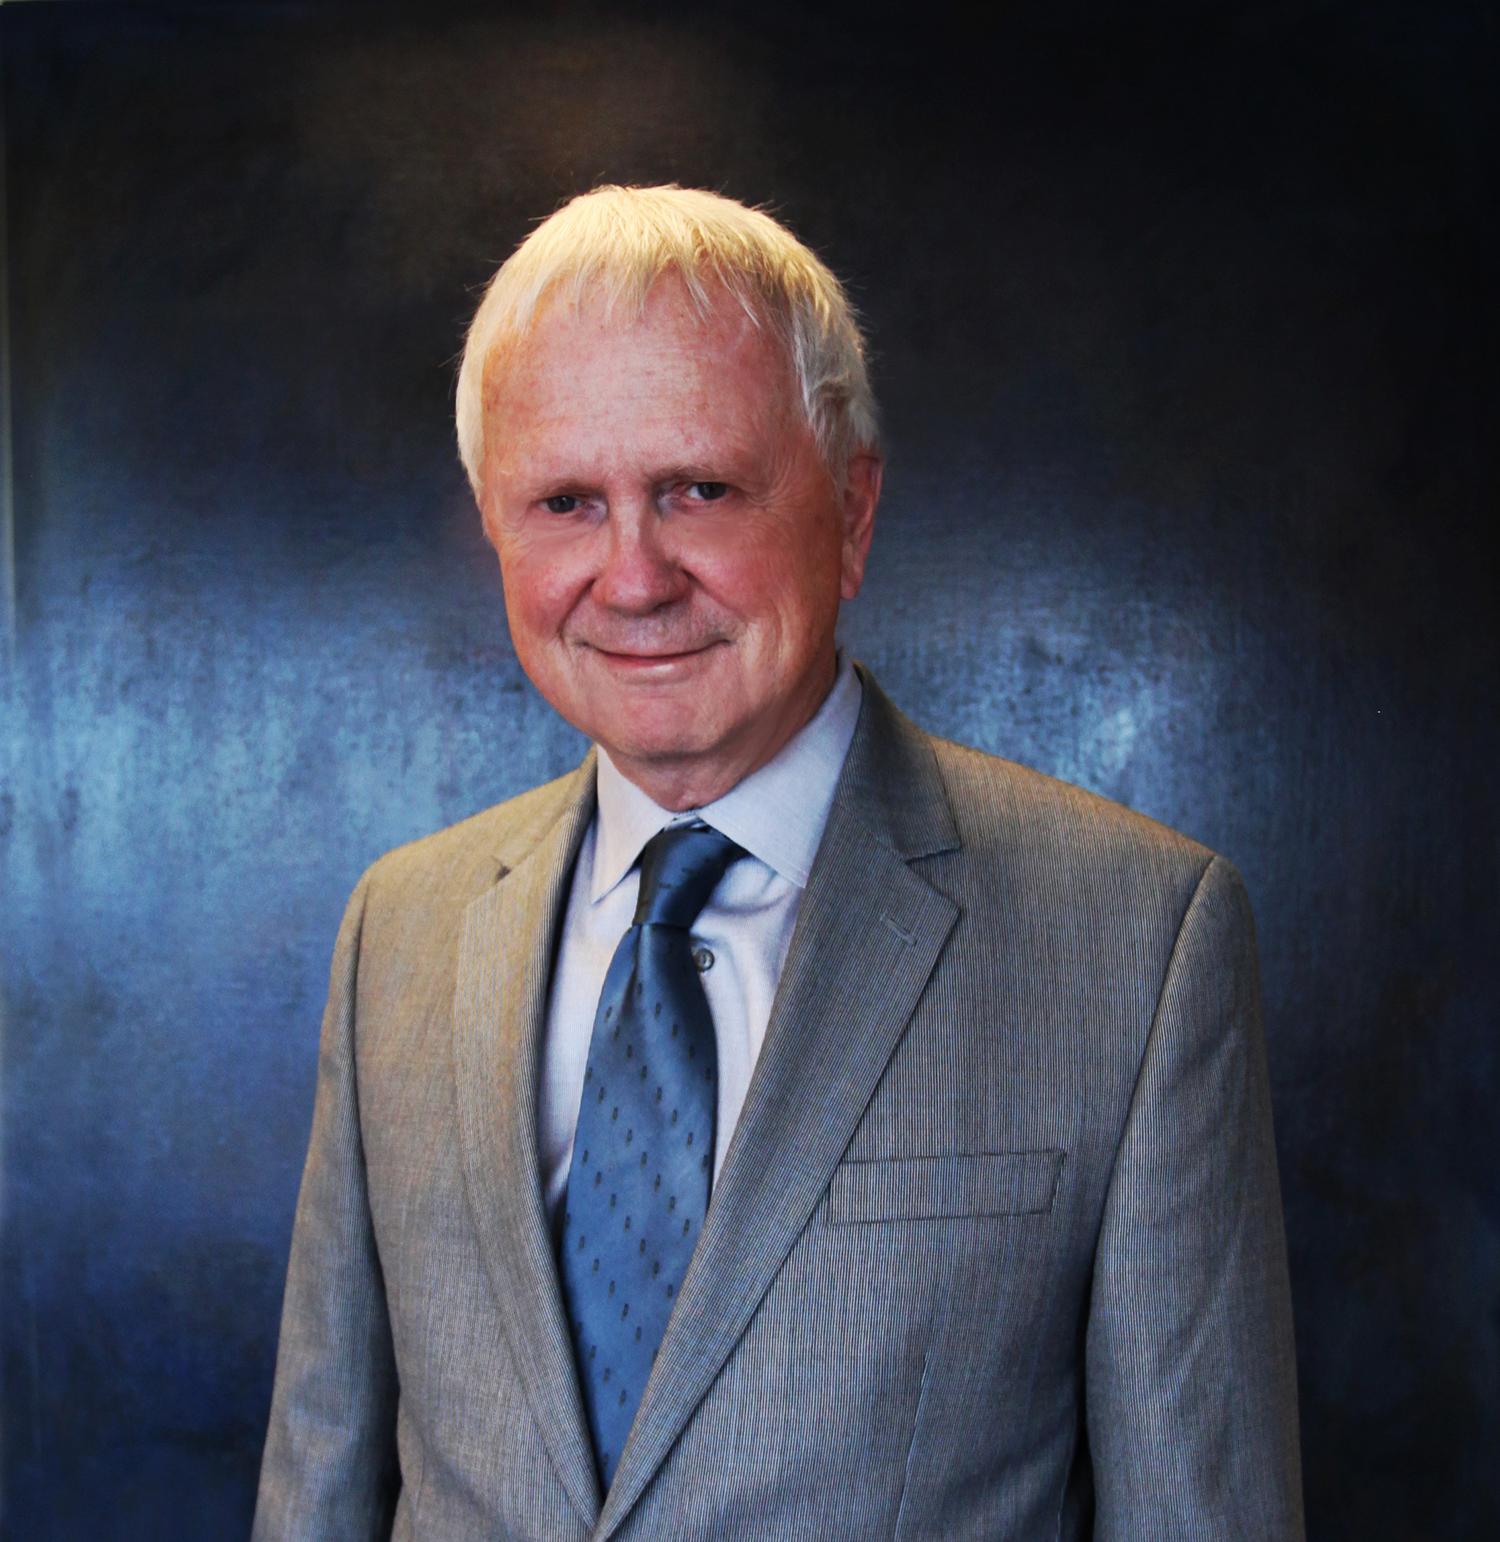 Kyle Johnson, Principal